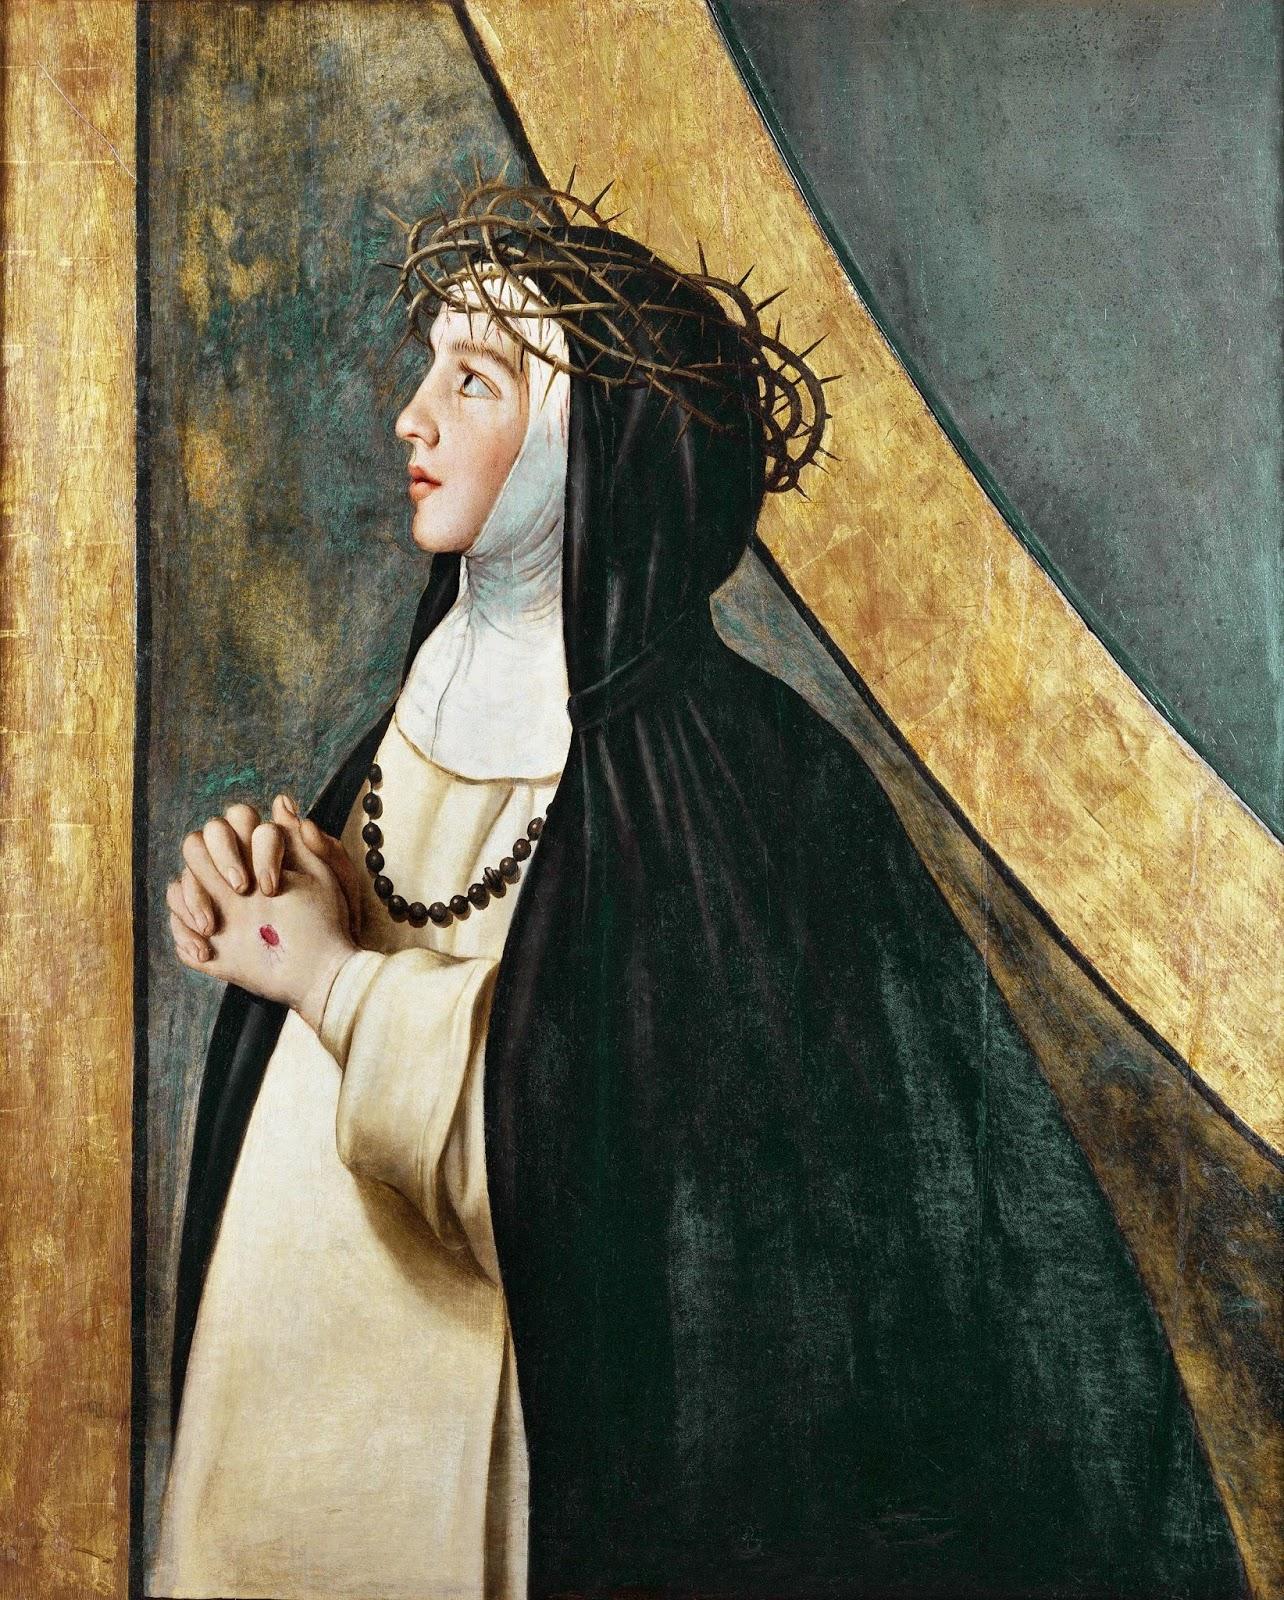 saint catherine of siena catholicism org